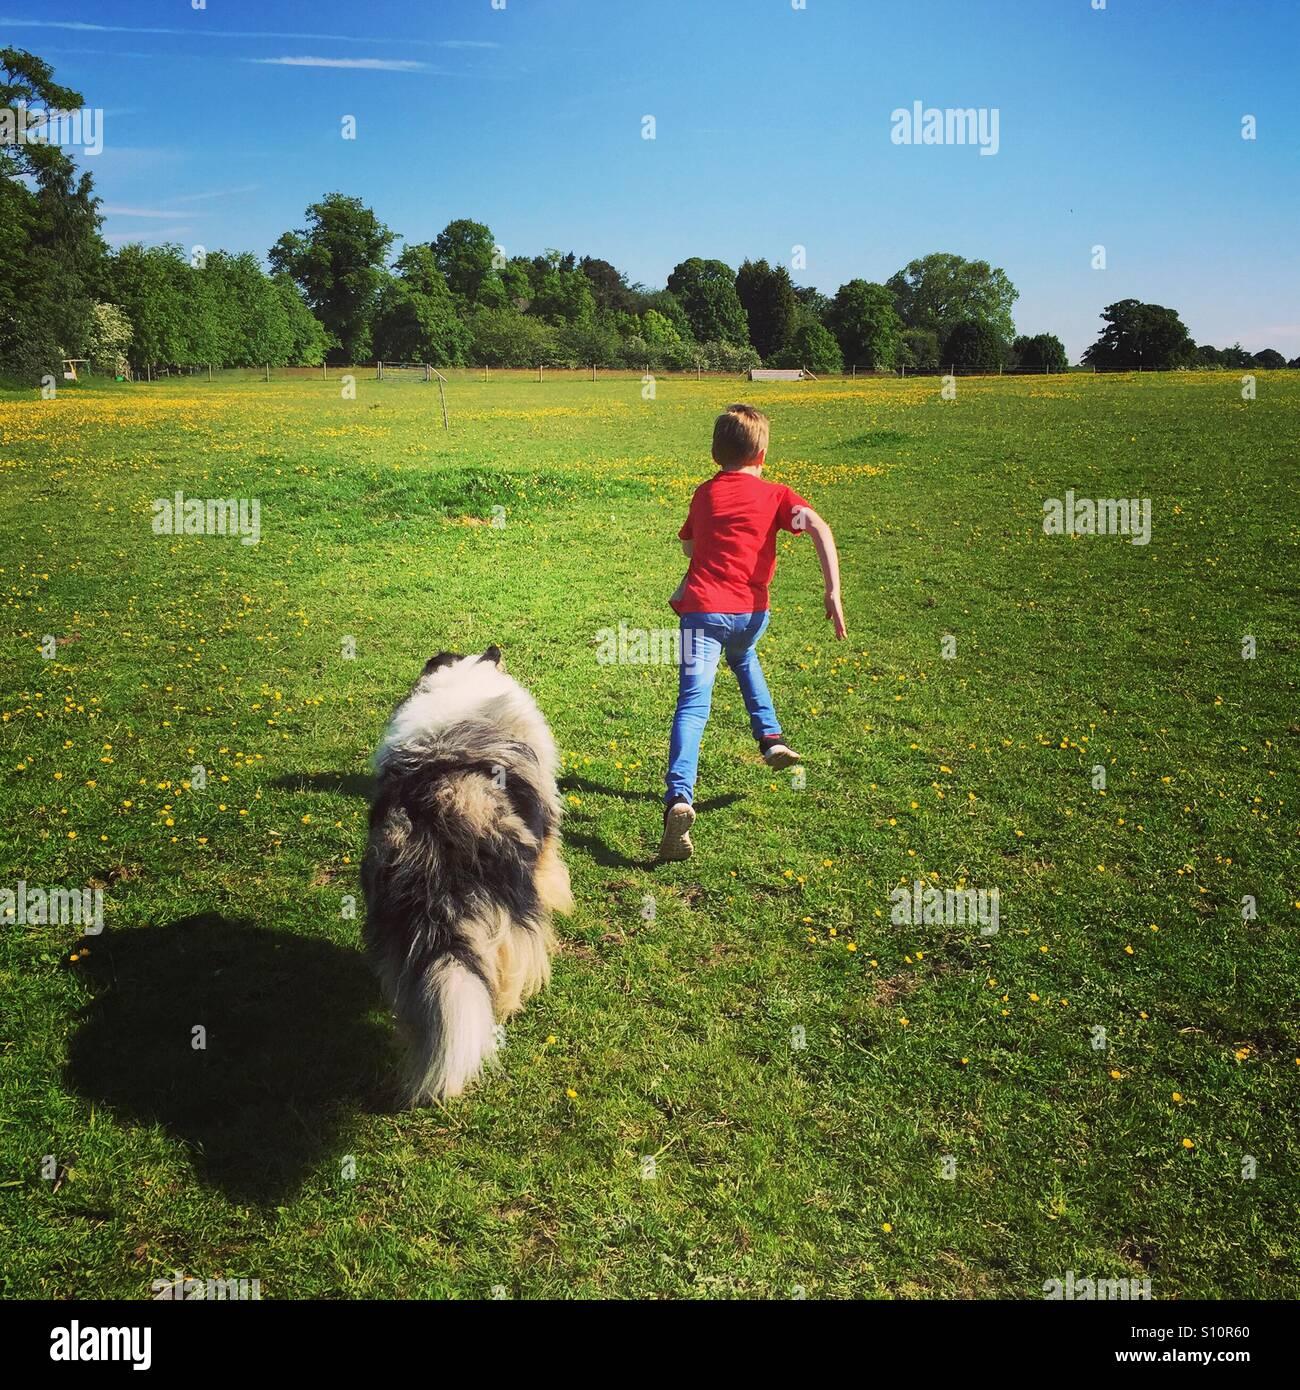 boy-and-dog-running-through-a-buttercup-